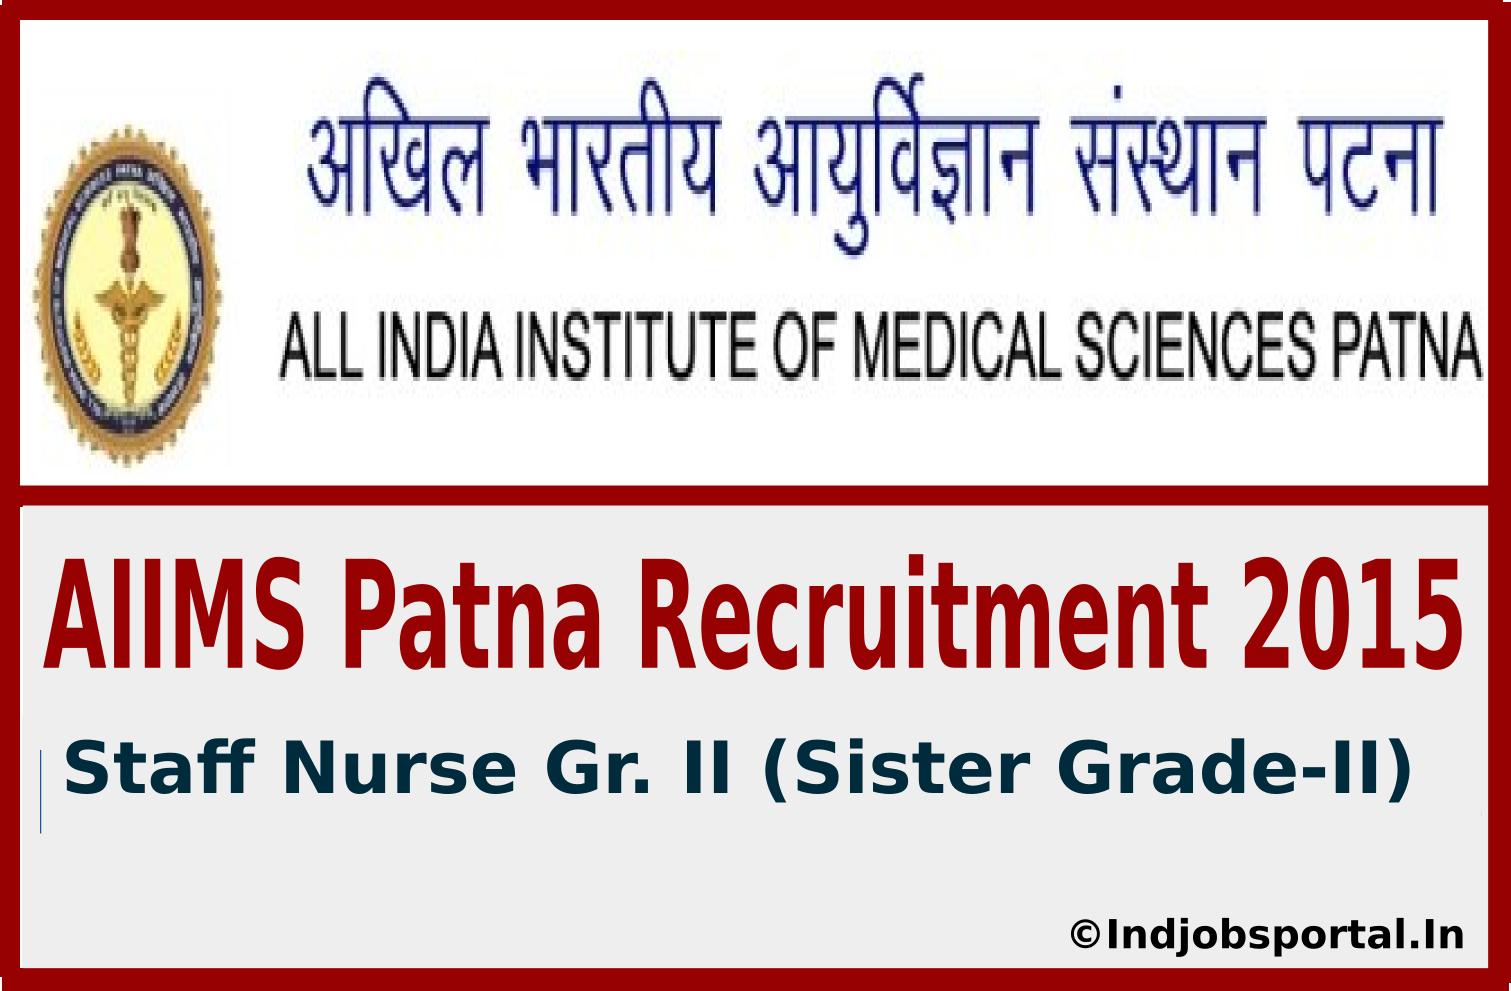 AIIMS Patna Recruitment 2015 For 441 Staff Nurse Gr. II (Sister Grade-II) Post